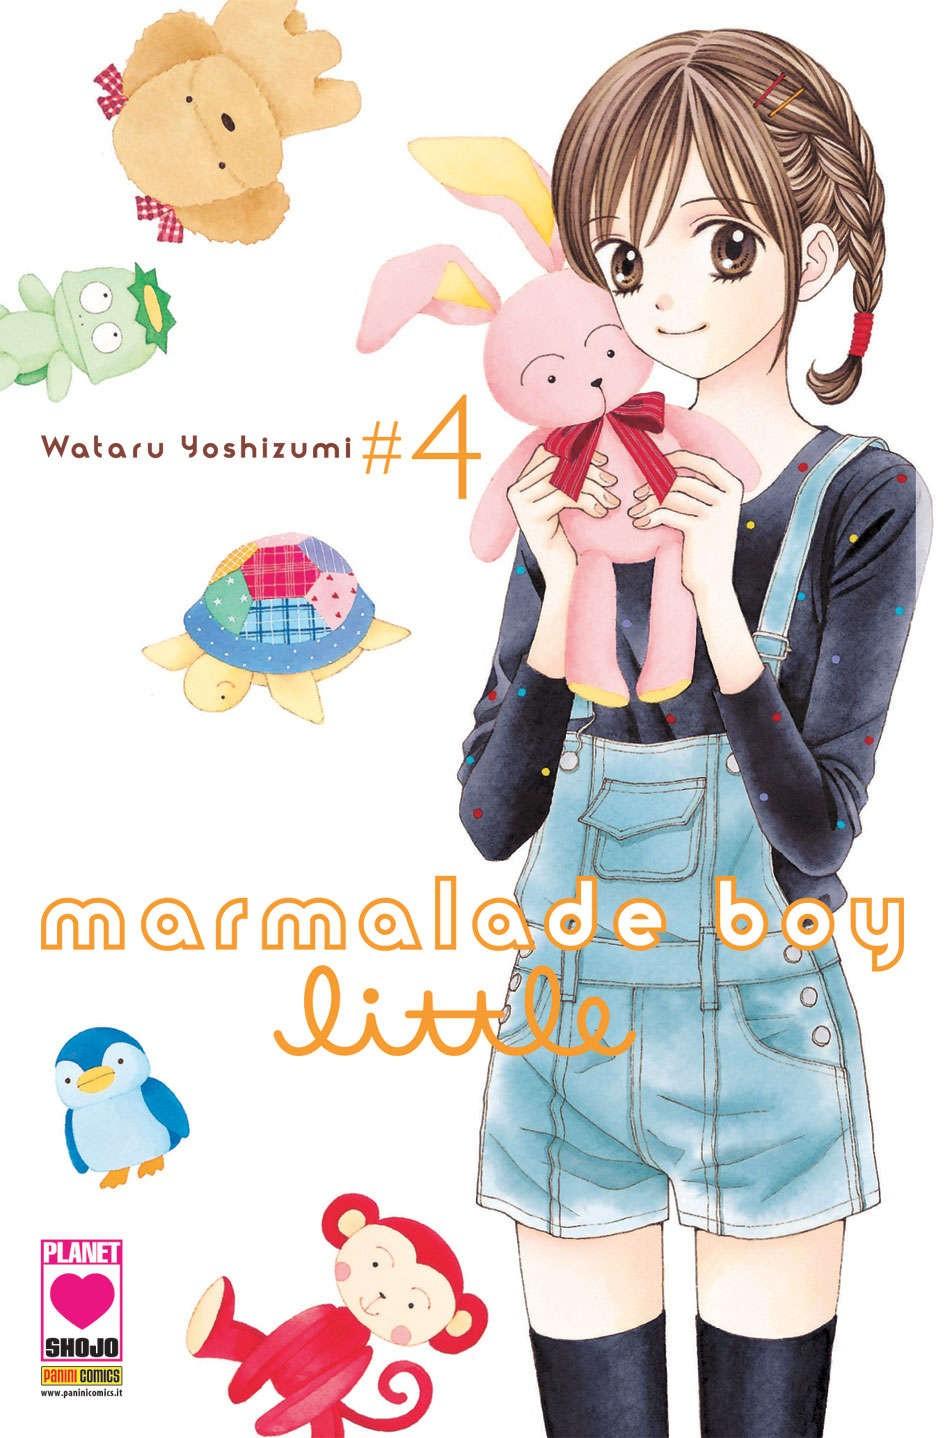 Marmalade Boy Little - N° 4 - Marmalade Boy Little - Manga Rainbow Planet Manga